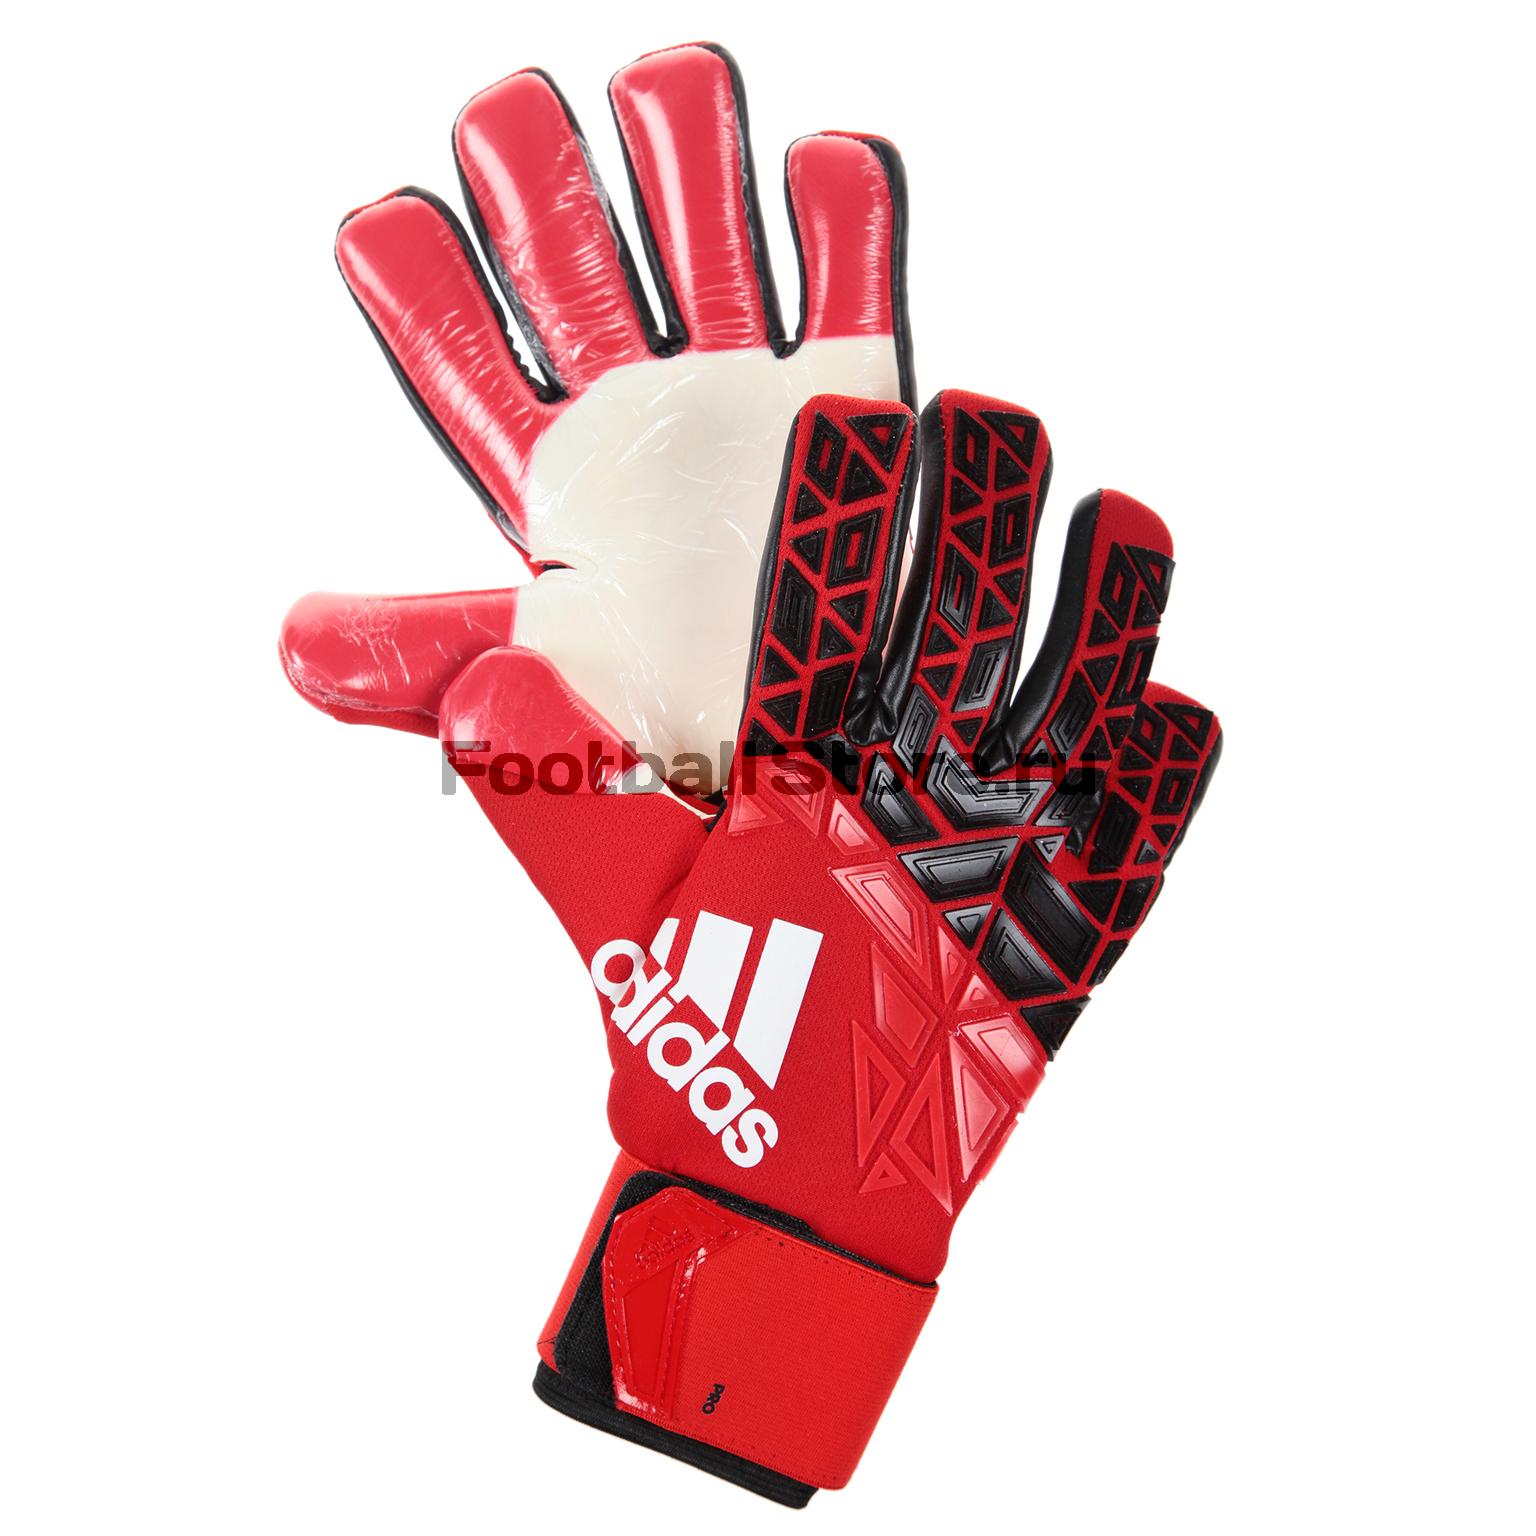 Перчатки вратарские Adidas Ace Trans Pro AZ3690 перчатки вратарские adidas ace half neg az3688